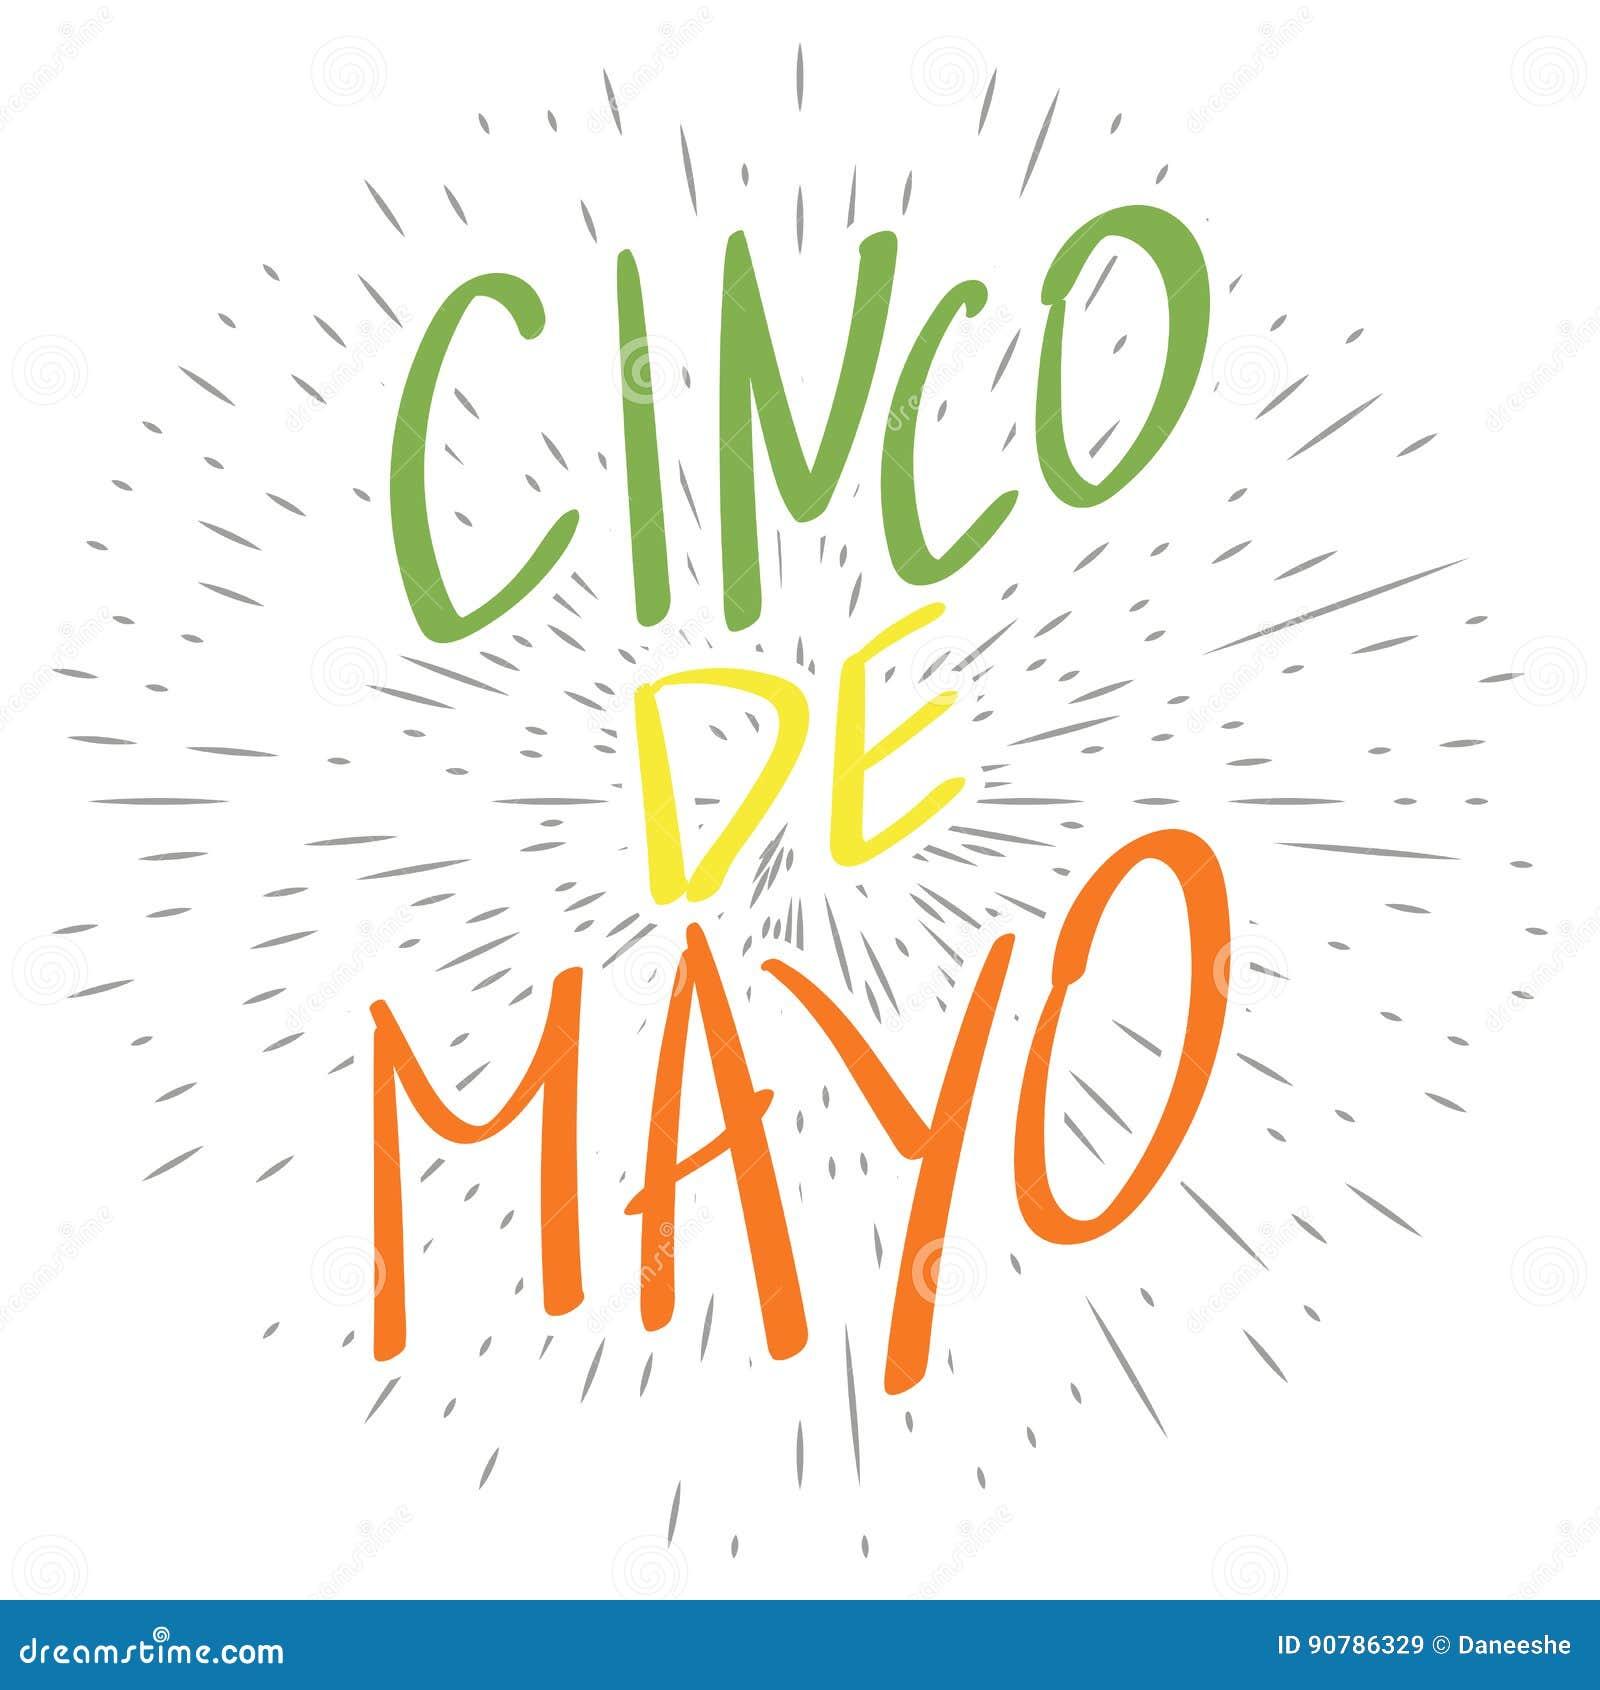 Cinco de mayo mexican holiday stock vector illustration of mexico cinco de mayo mexican holiday m4hsunfo